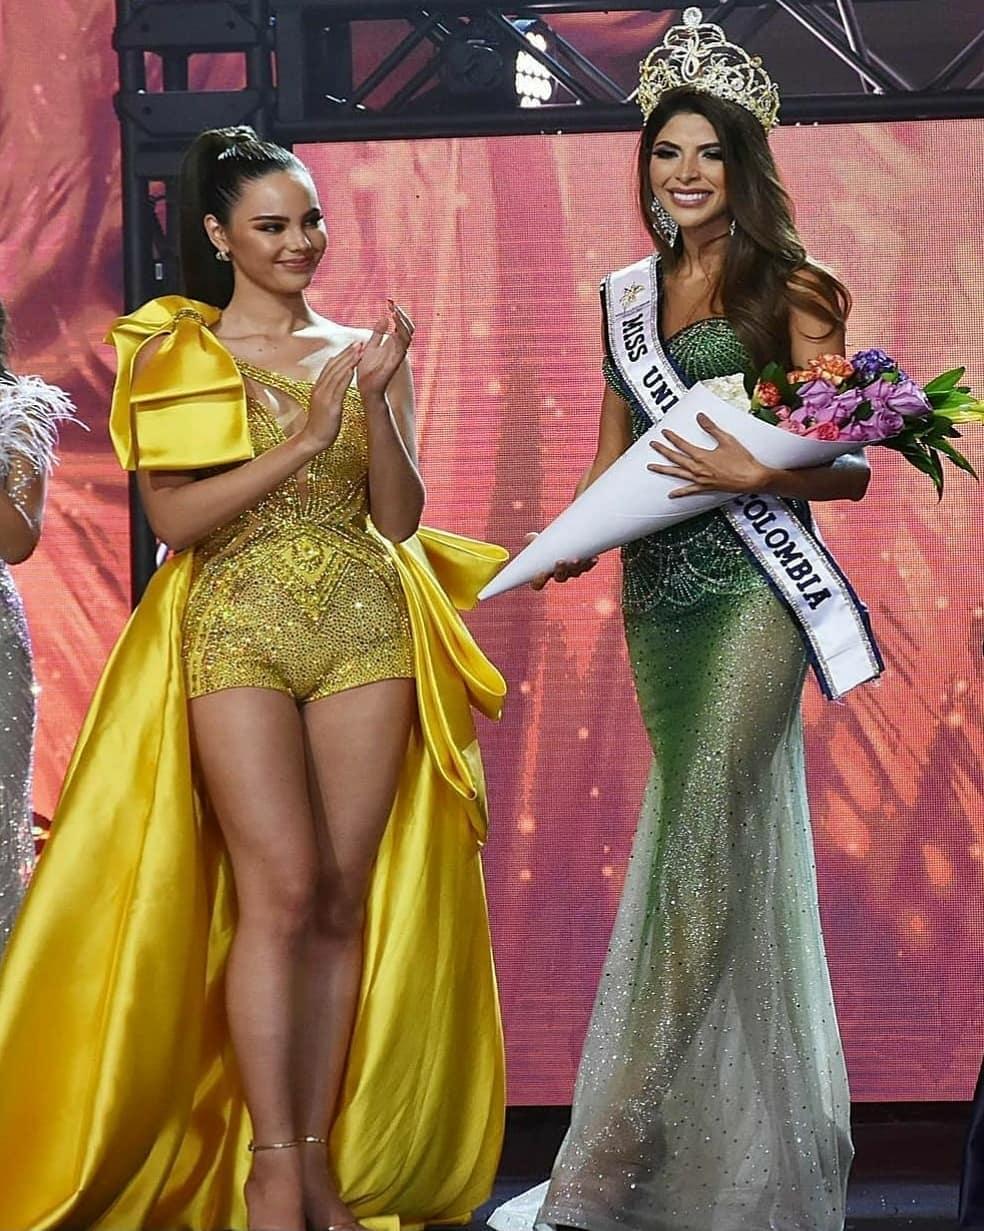 laura olascuaga, miss colombia universo 2020. - Página 5 Estilo10